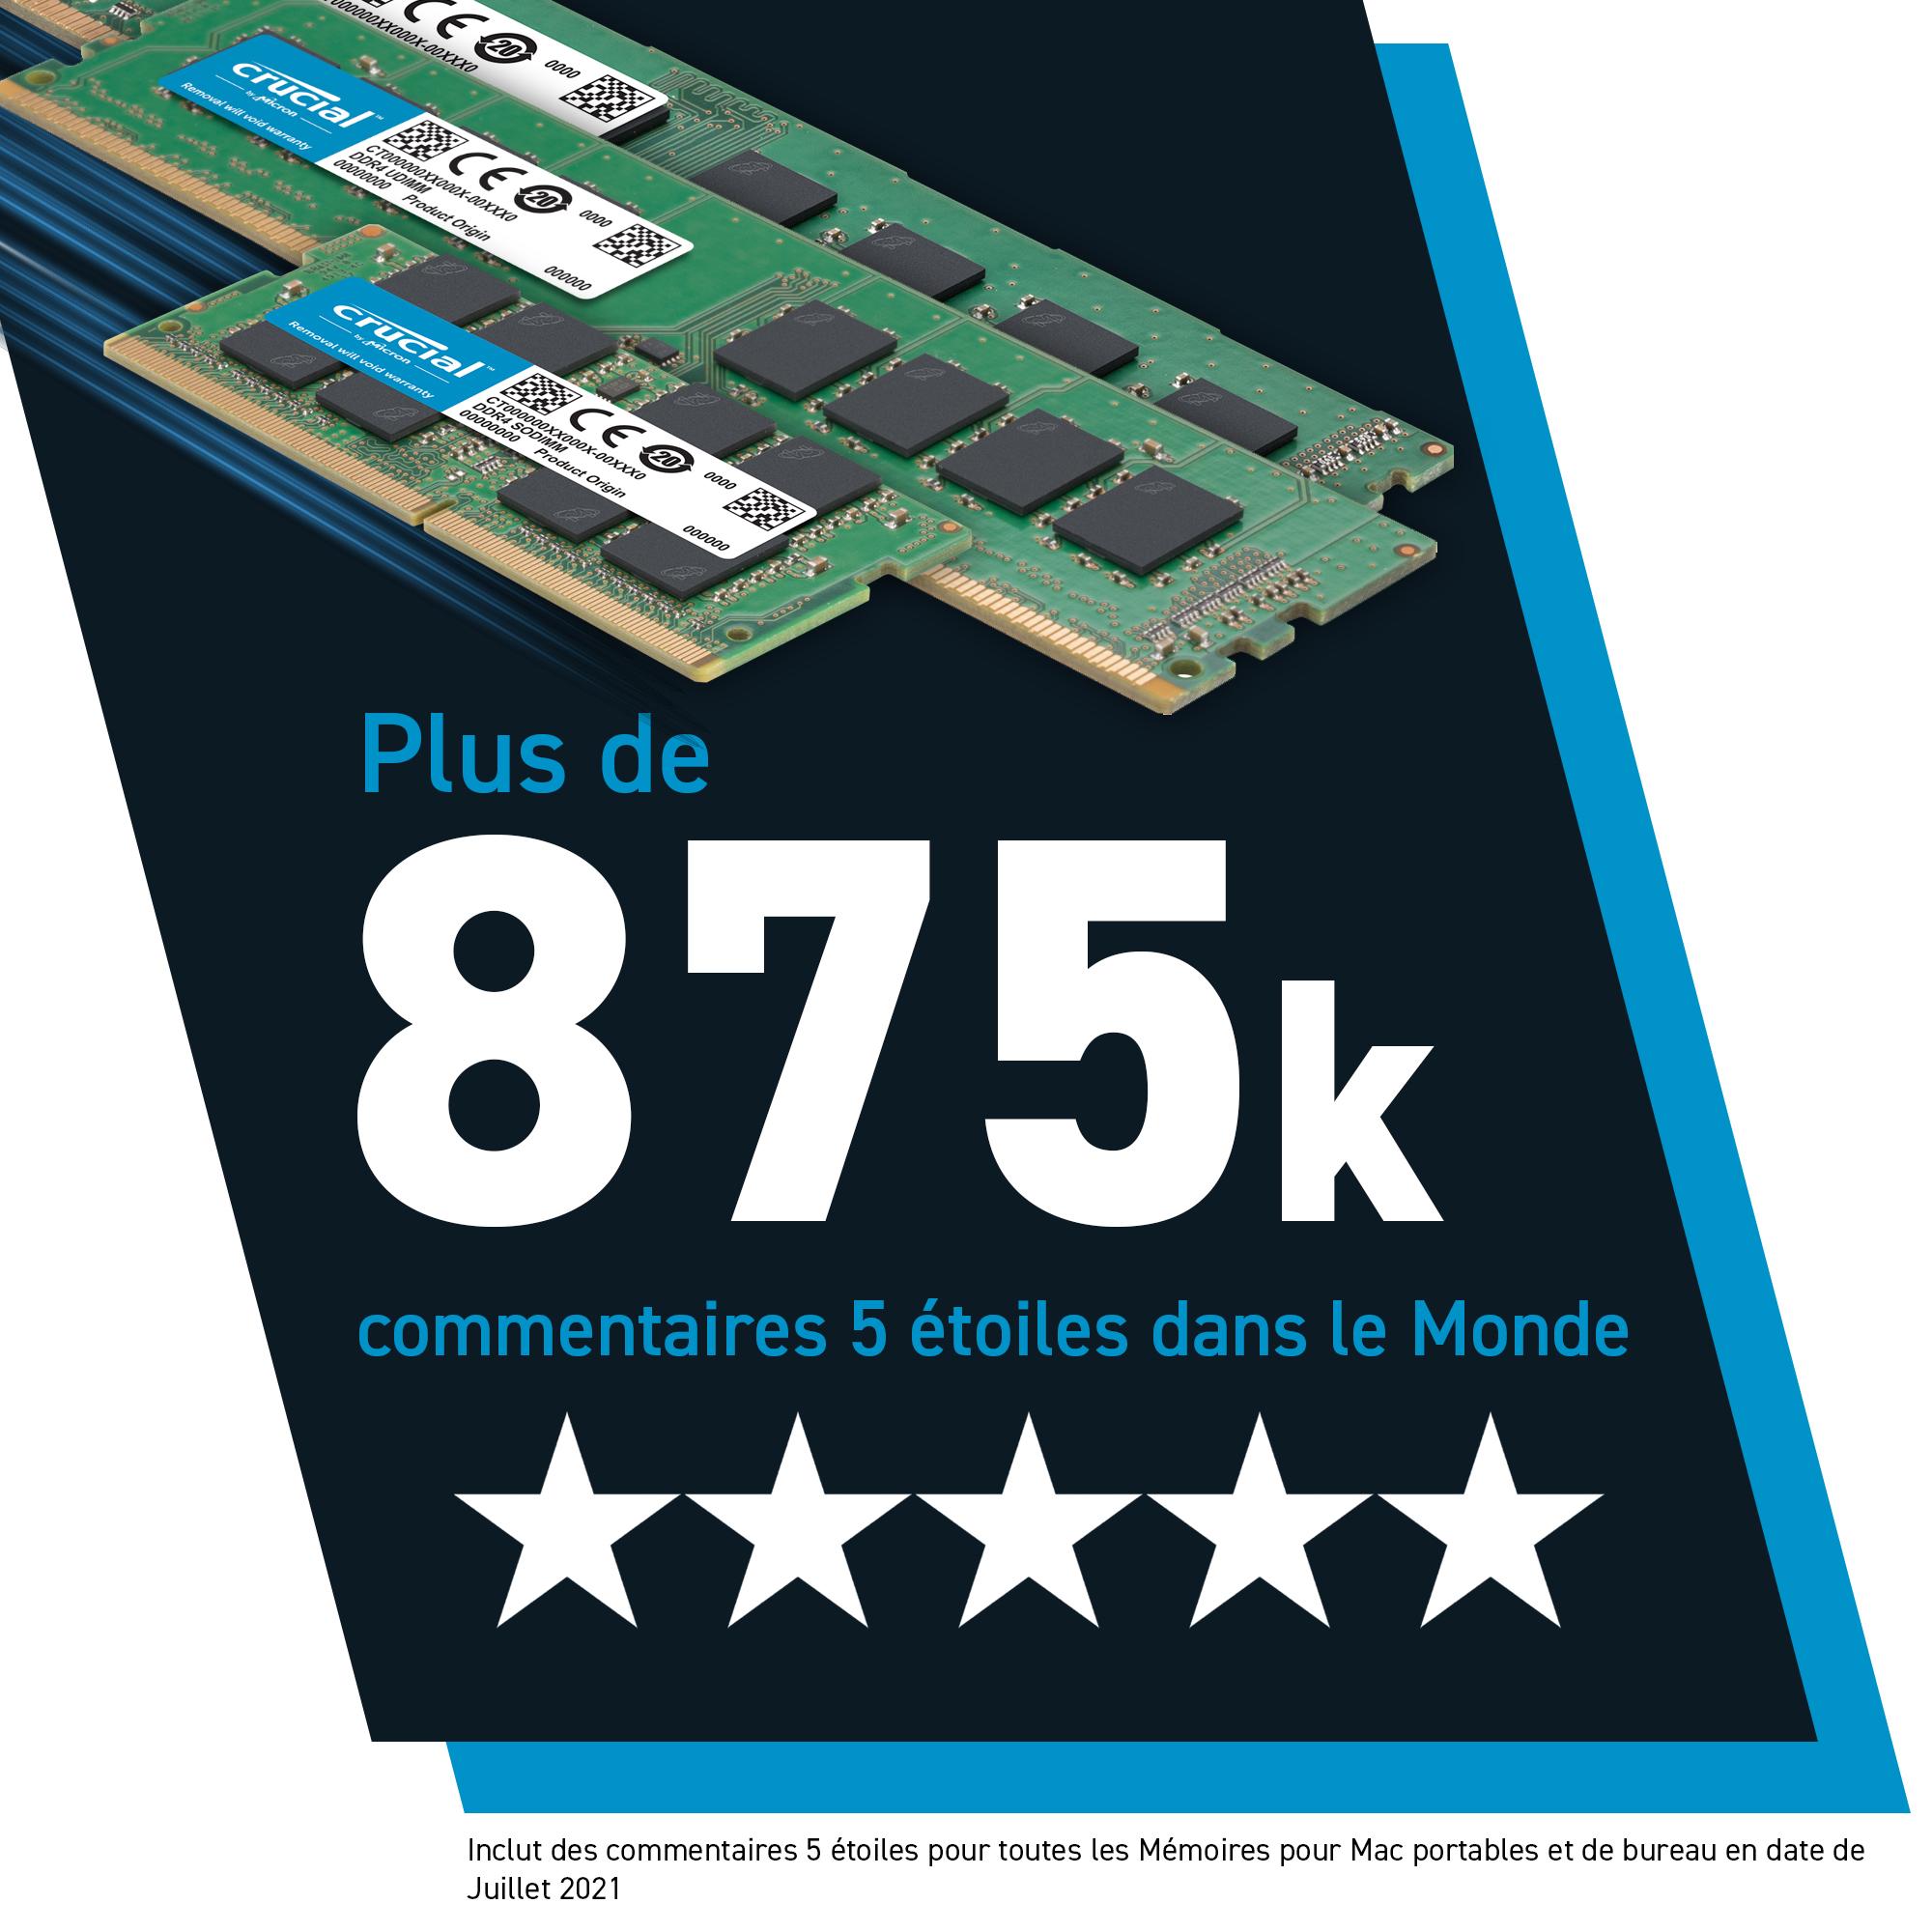 Crucial 16GB Kit (2 x 8GB) DDR4-2400 SODIMM- view 2